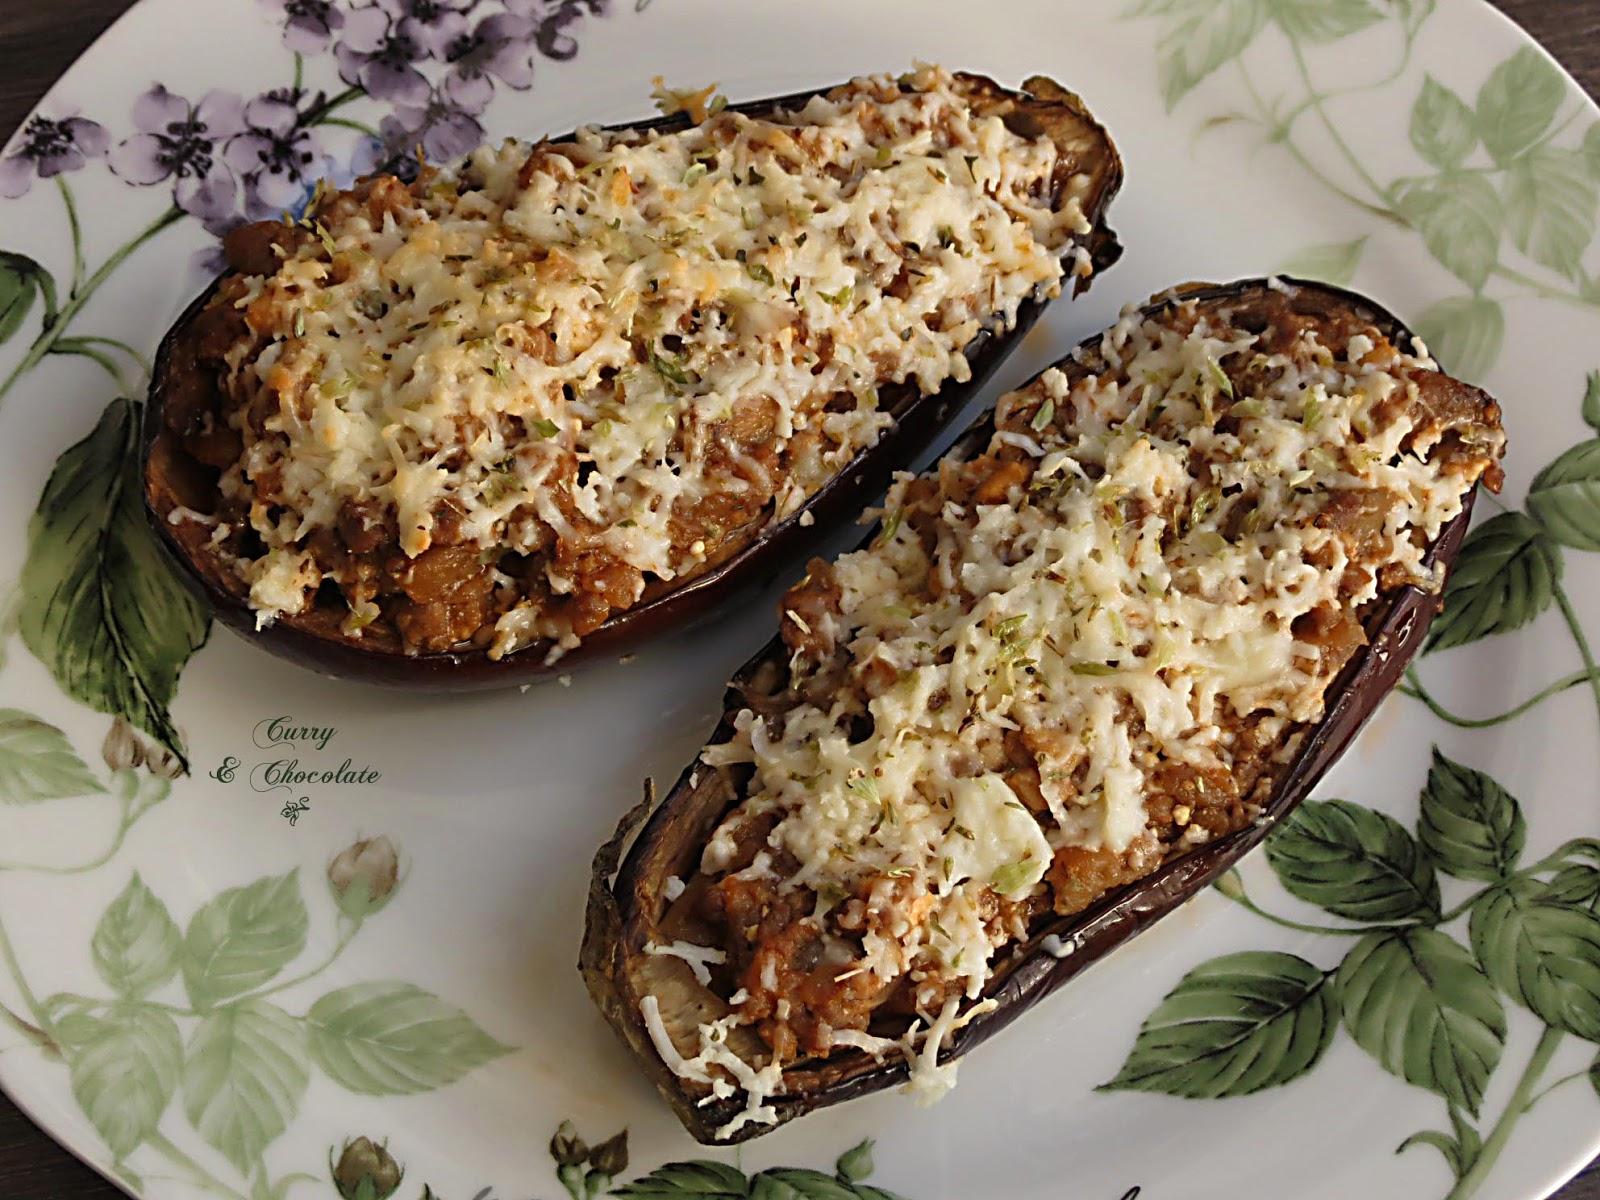 Berenjenas rellenas de carne picada - Stuffed eggplants with minced meat